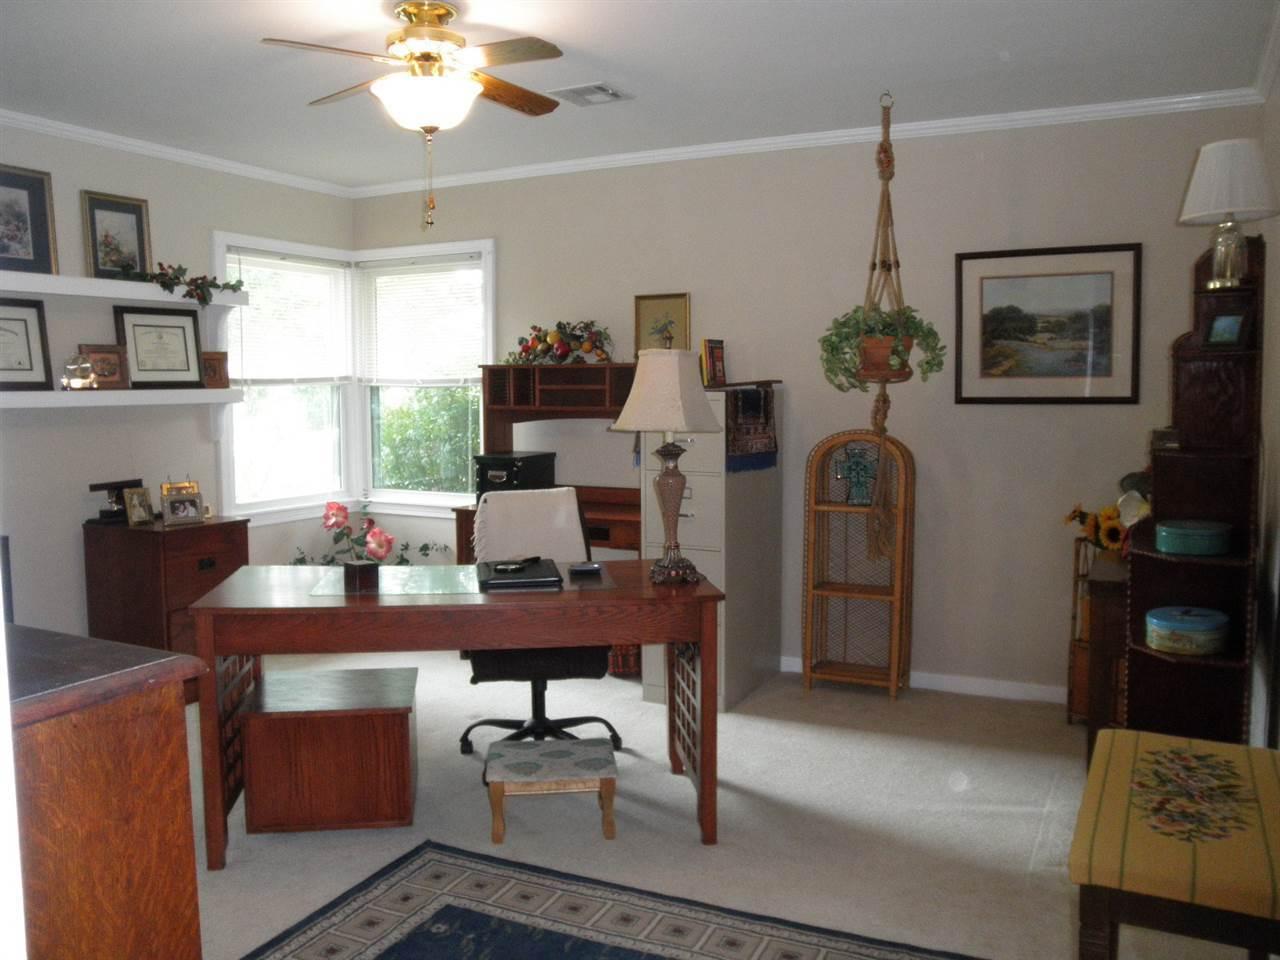 Sold Cross Sale W/ MLS | 127 Fairview  Ponca City, OK 74601 22